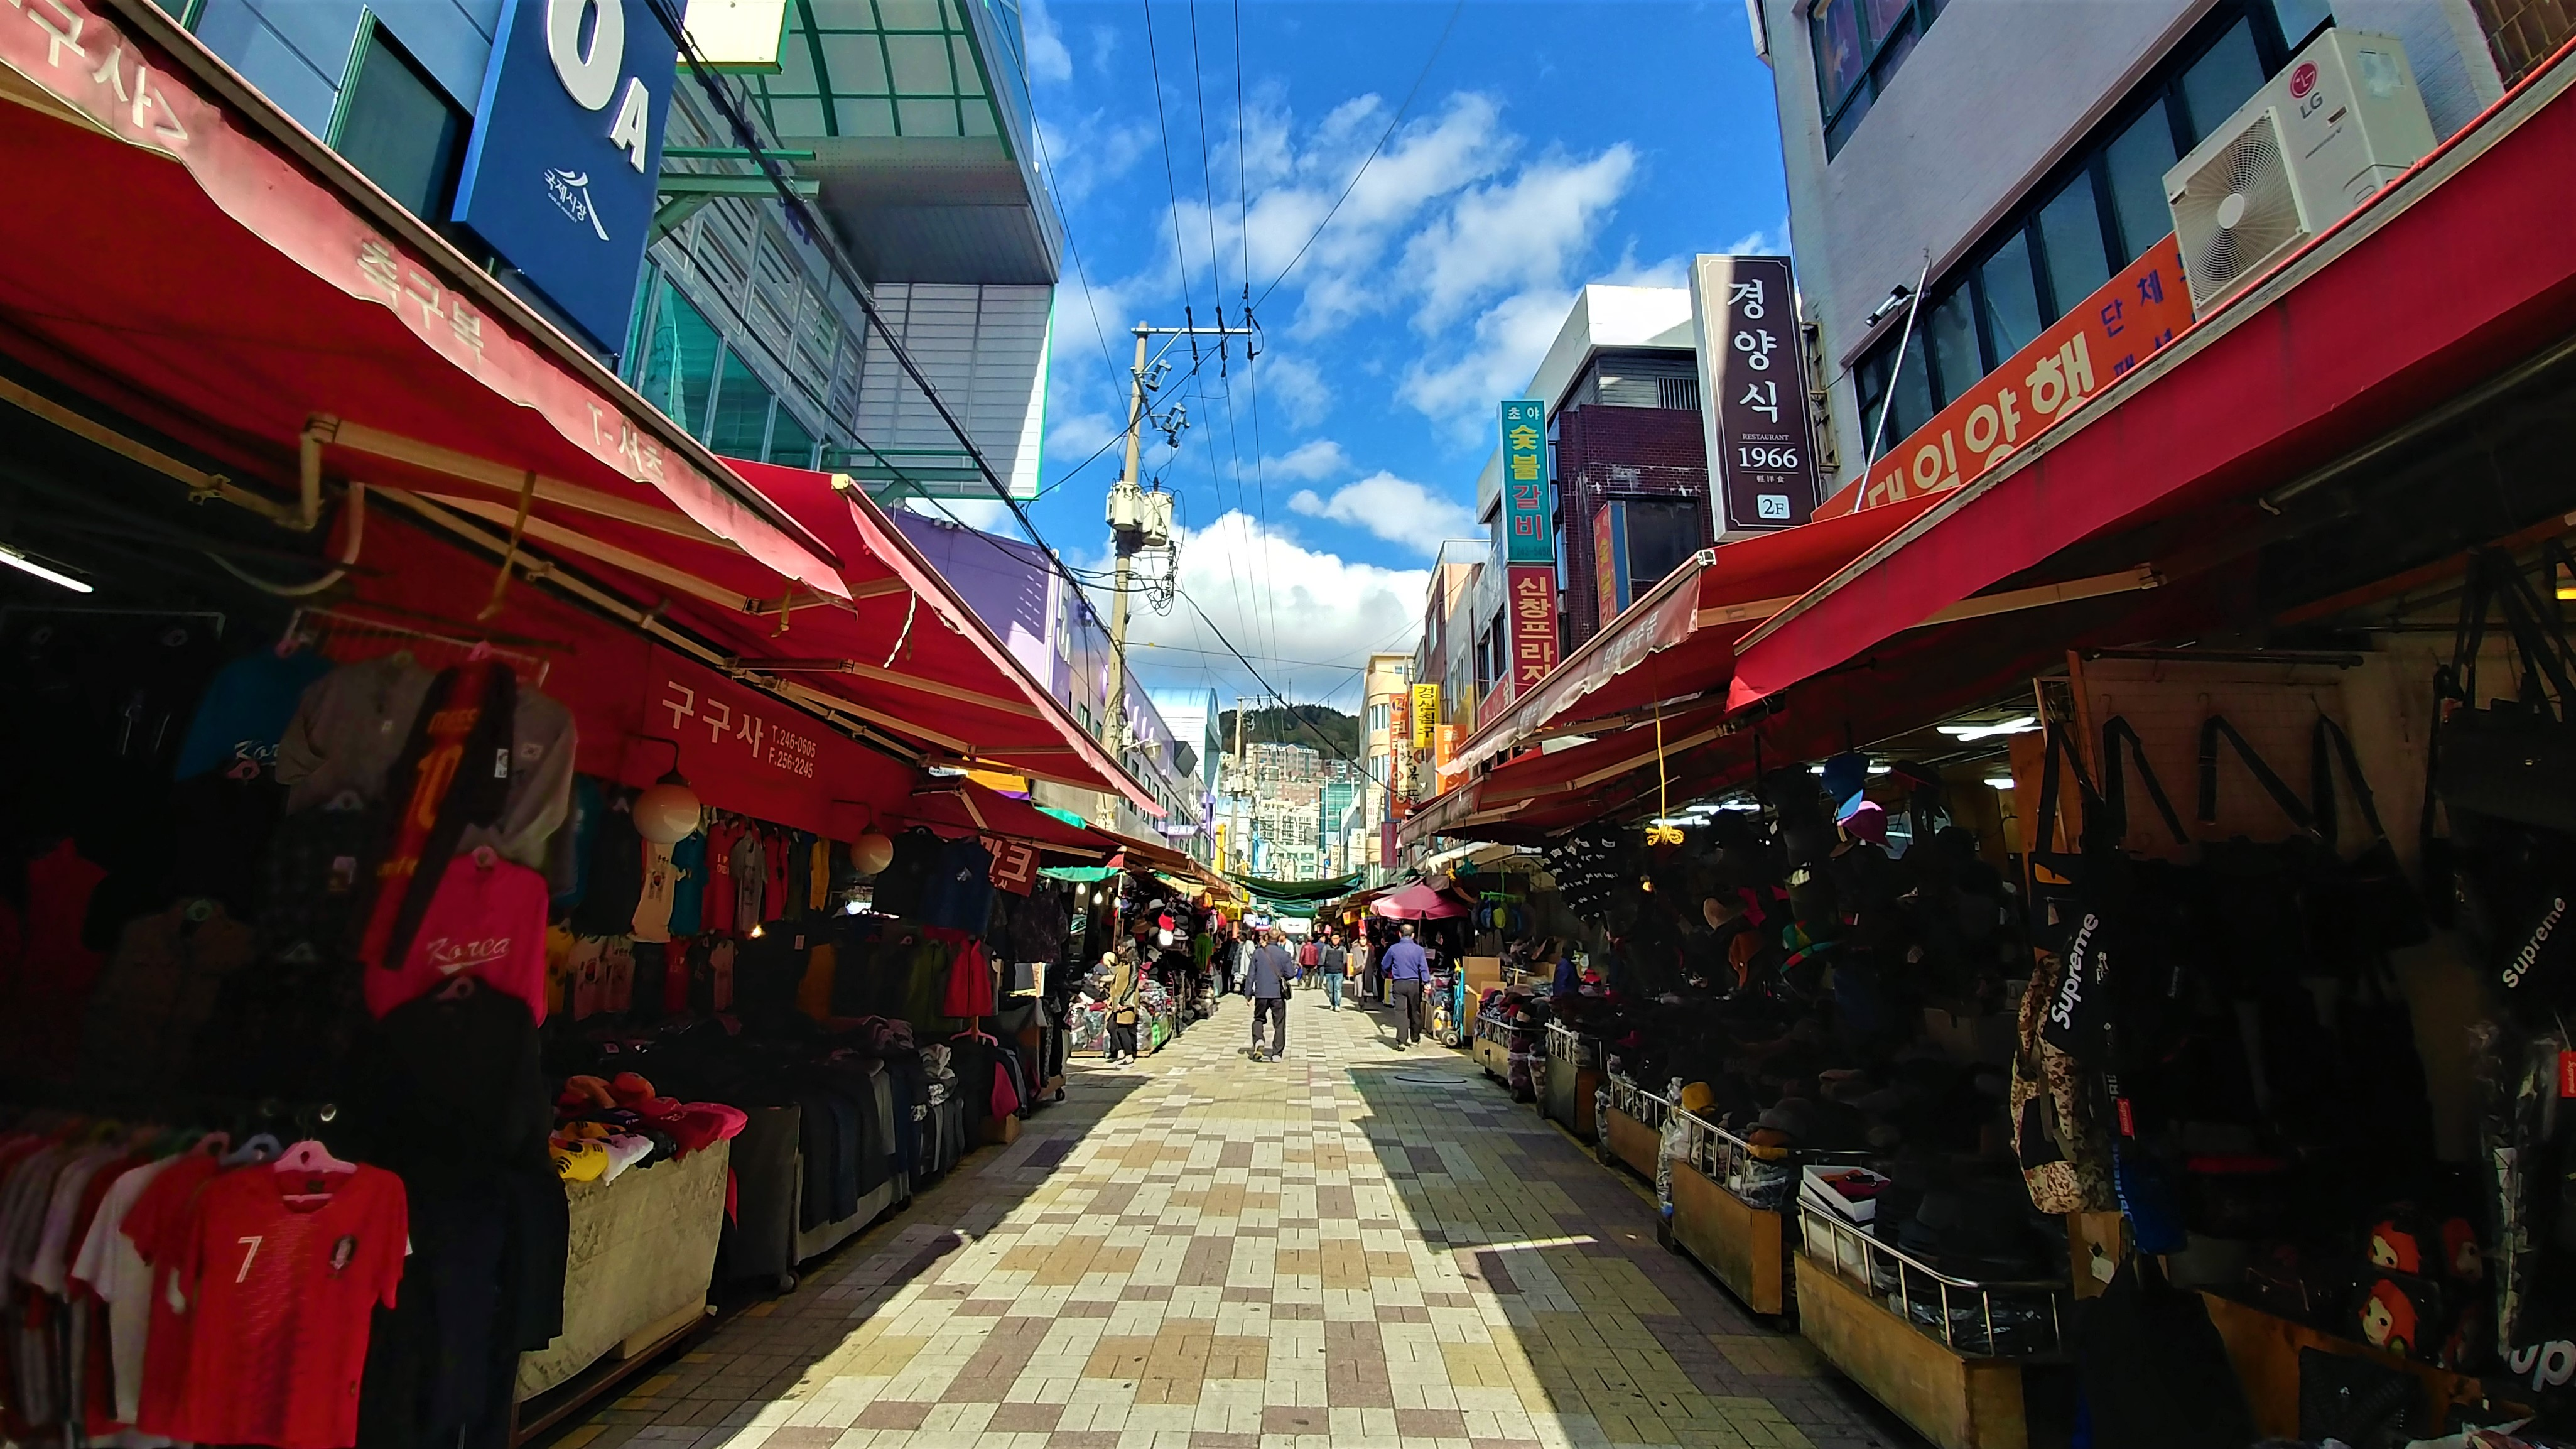 Busan marche gukje biff square visite ou aller jjimjilbang blog voyage coree du sud arpenter le chemin